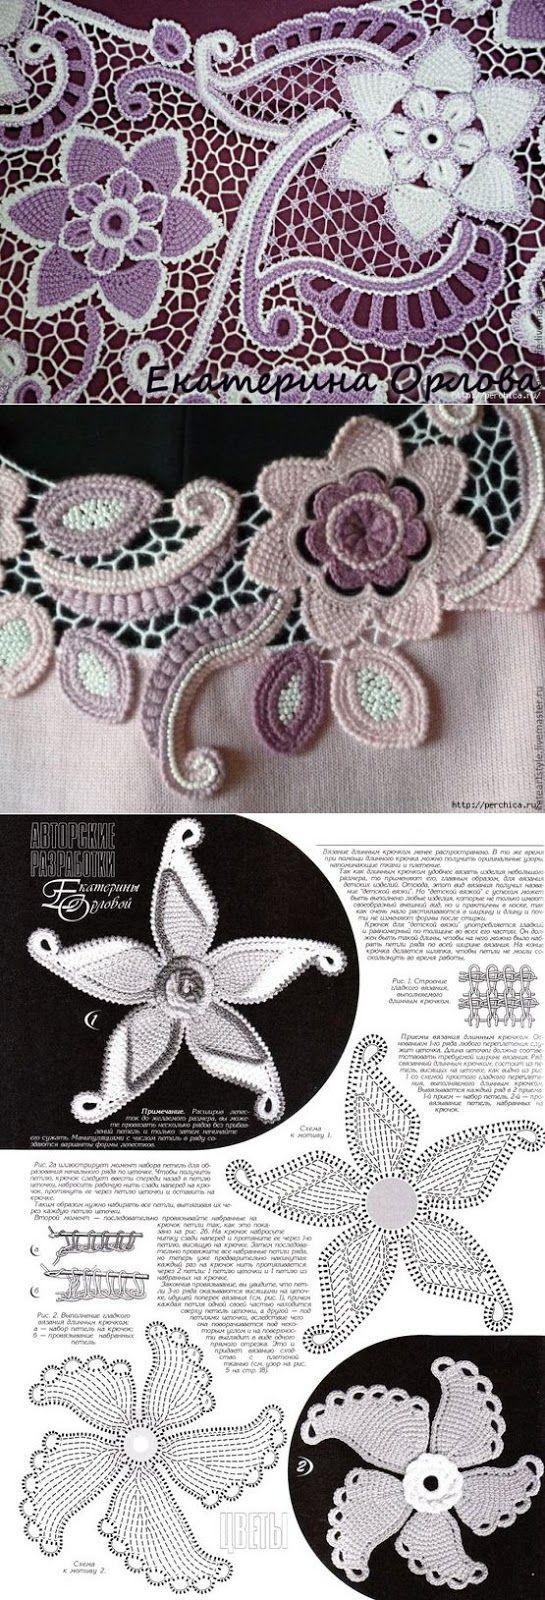 Irish crochet lace motifs patterns | Crochet flowers and leaves ...